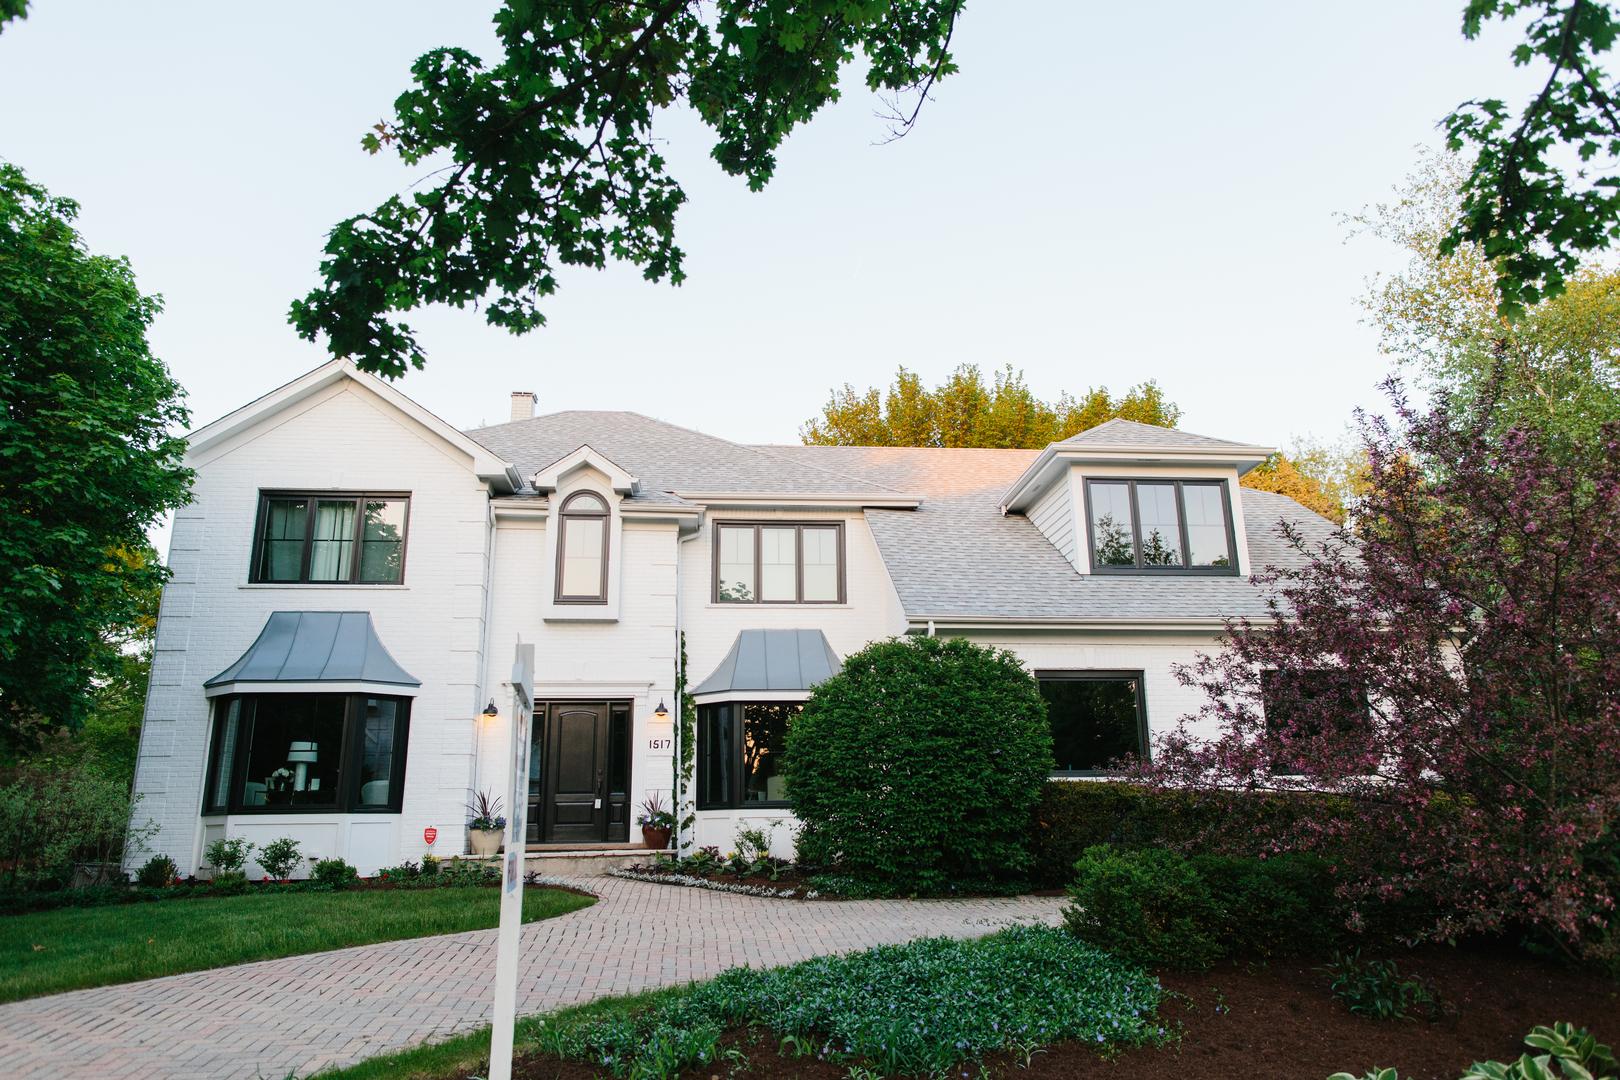 Homes for sale in the Eagle Brook subdivision | Geneva, Illinois ...